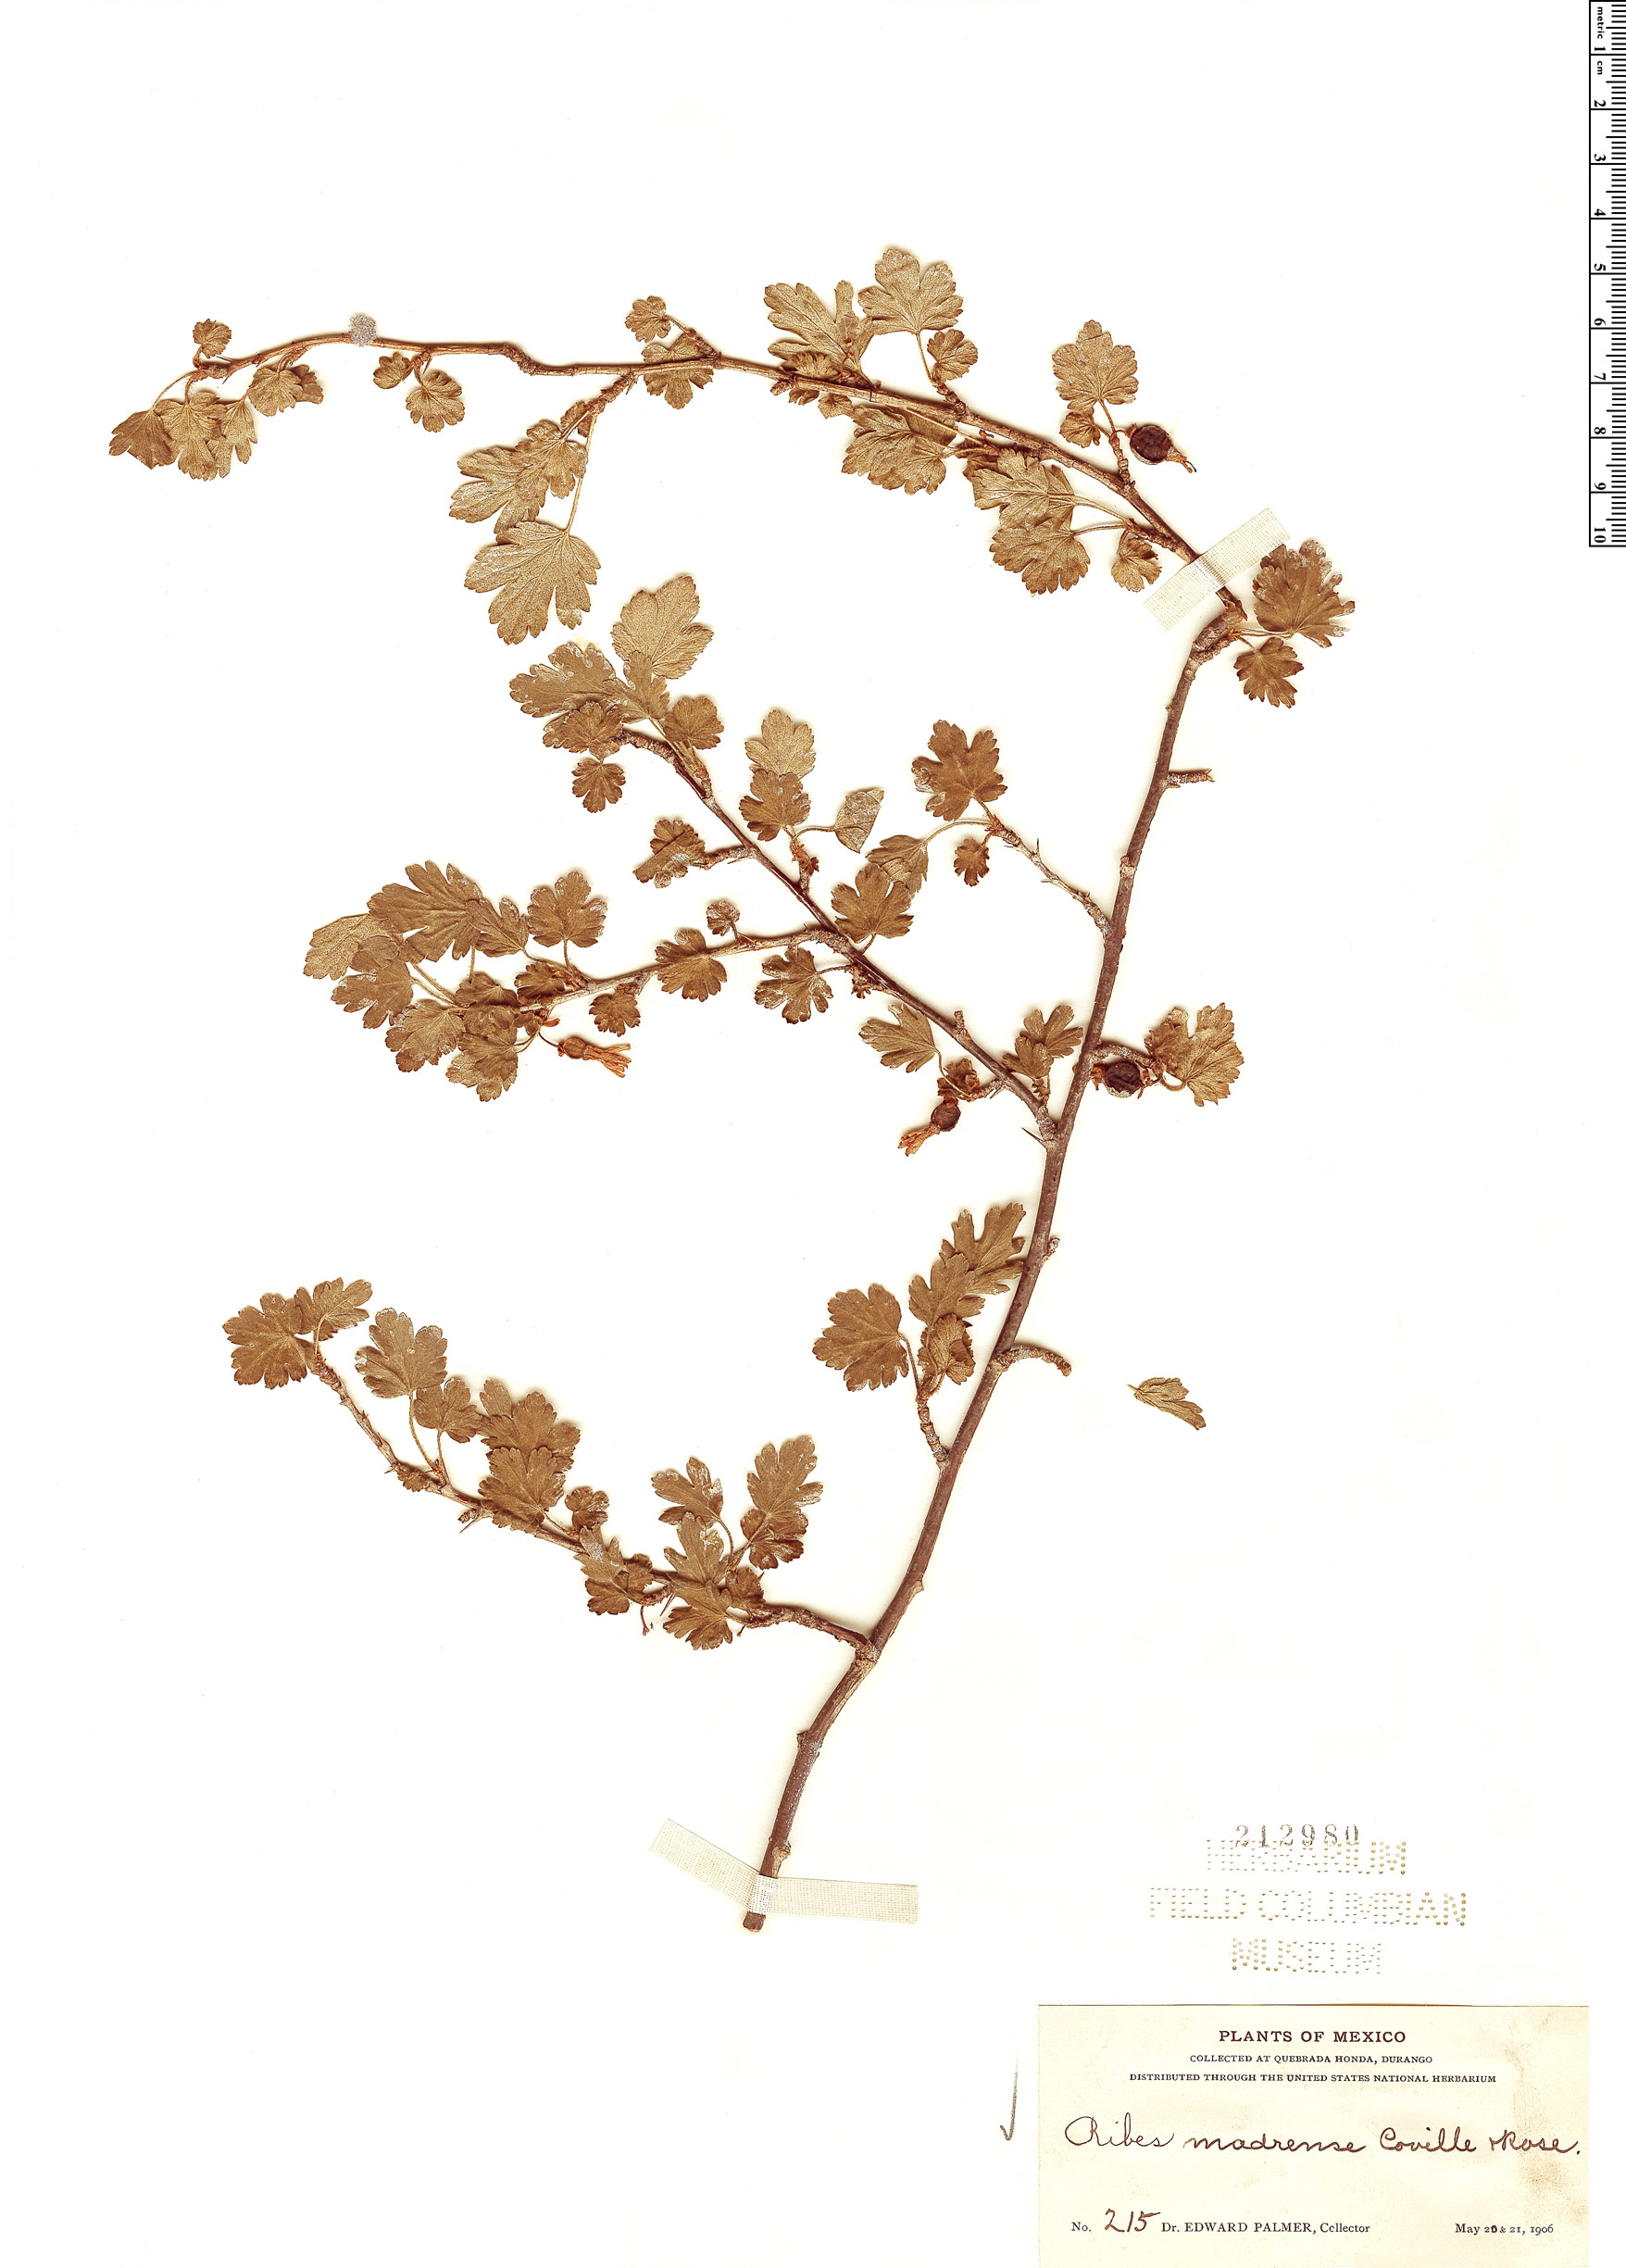 Specimen: Ribes madrense